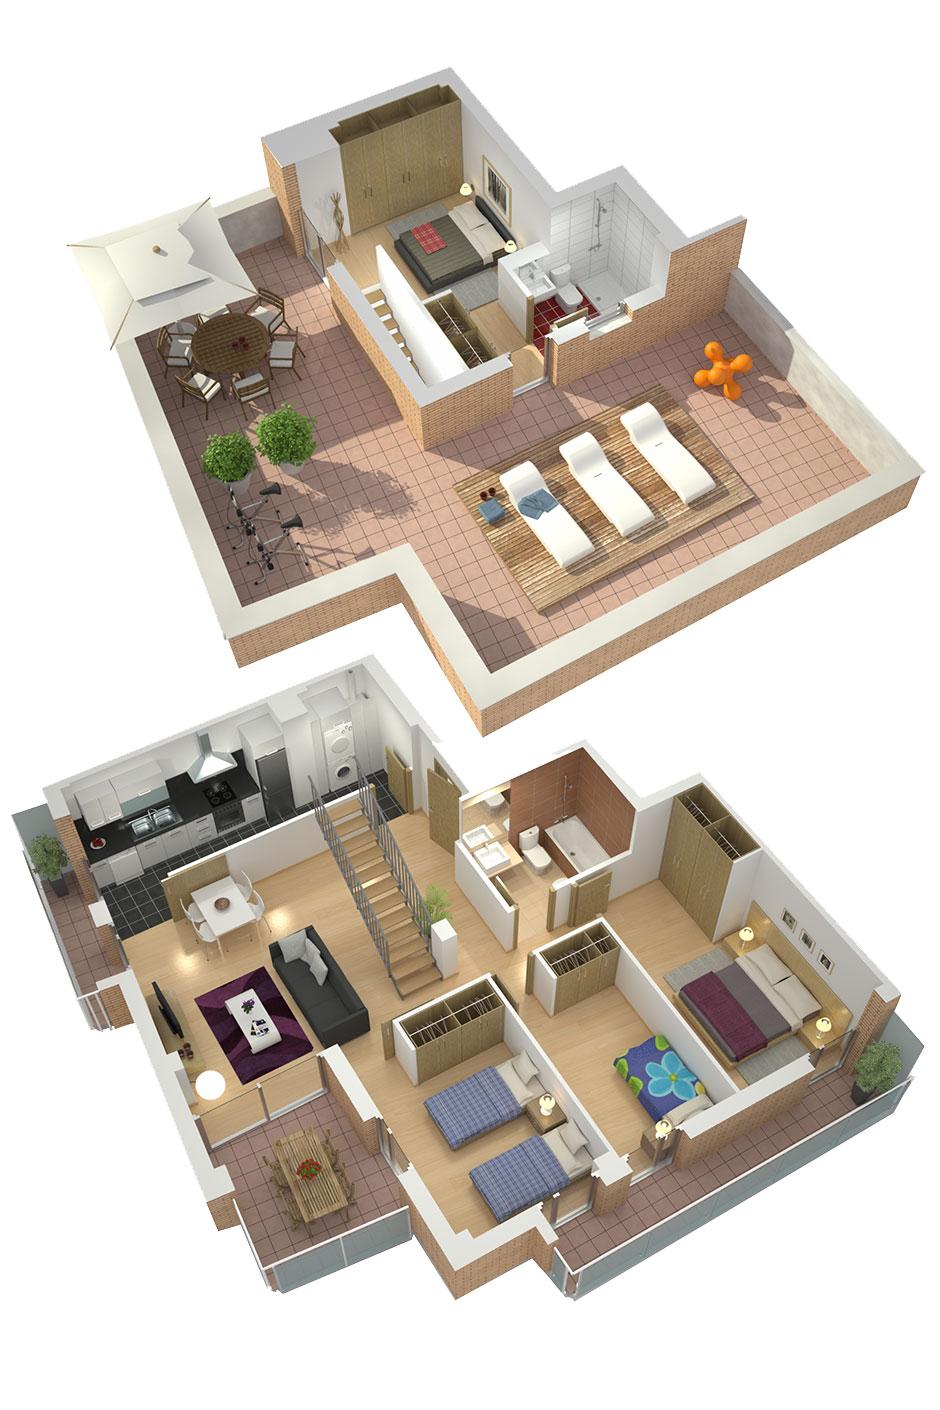 estudibasic-plantas-3d-axonometricas-casas